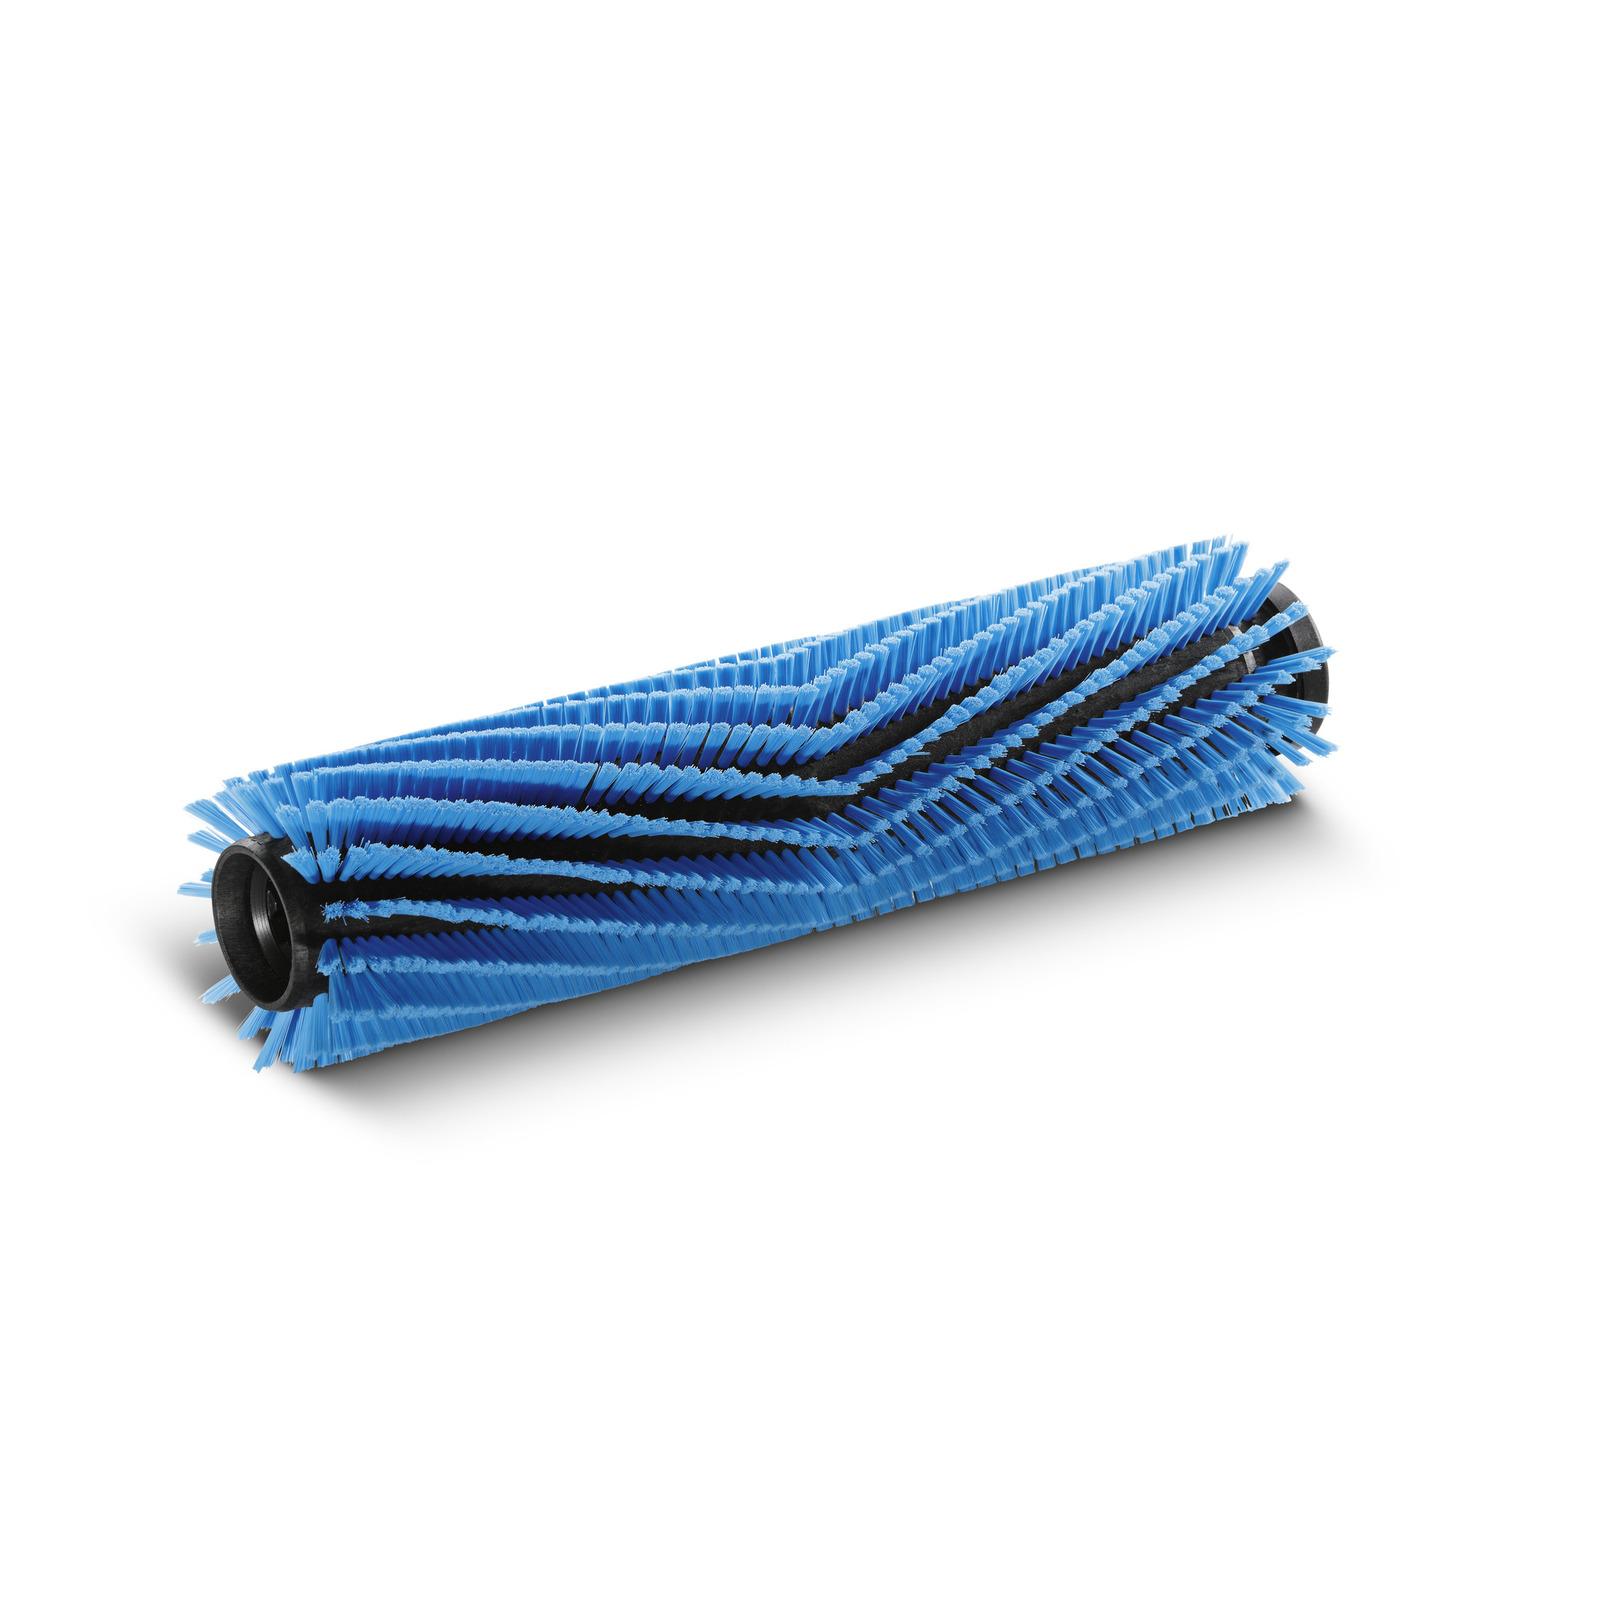 walzenb rste weich blau 300 mm k rcher. Black Bedroom Furniture Sets. Home Design Ideas